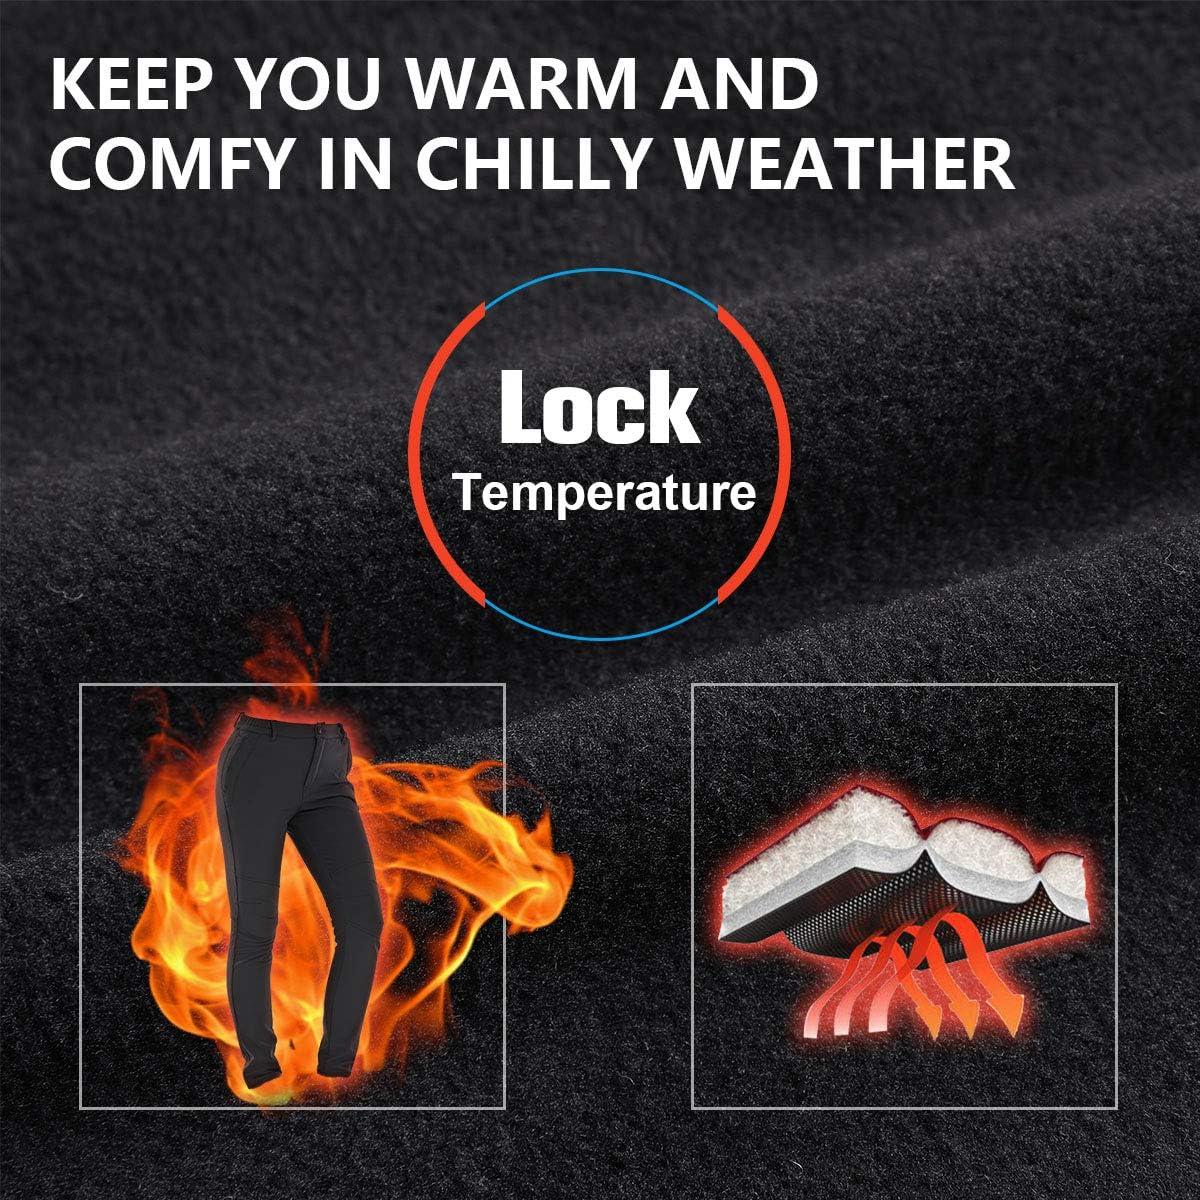 30 Ski Pants Women Waterproof Snow Winter Insulated Warm Outdoor Fleece Lined Hiking Pants with Zipper Pockets 2166 Grey